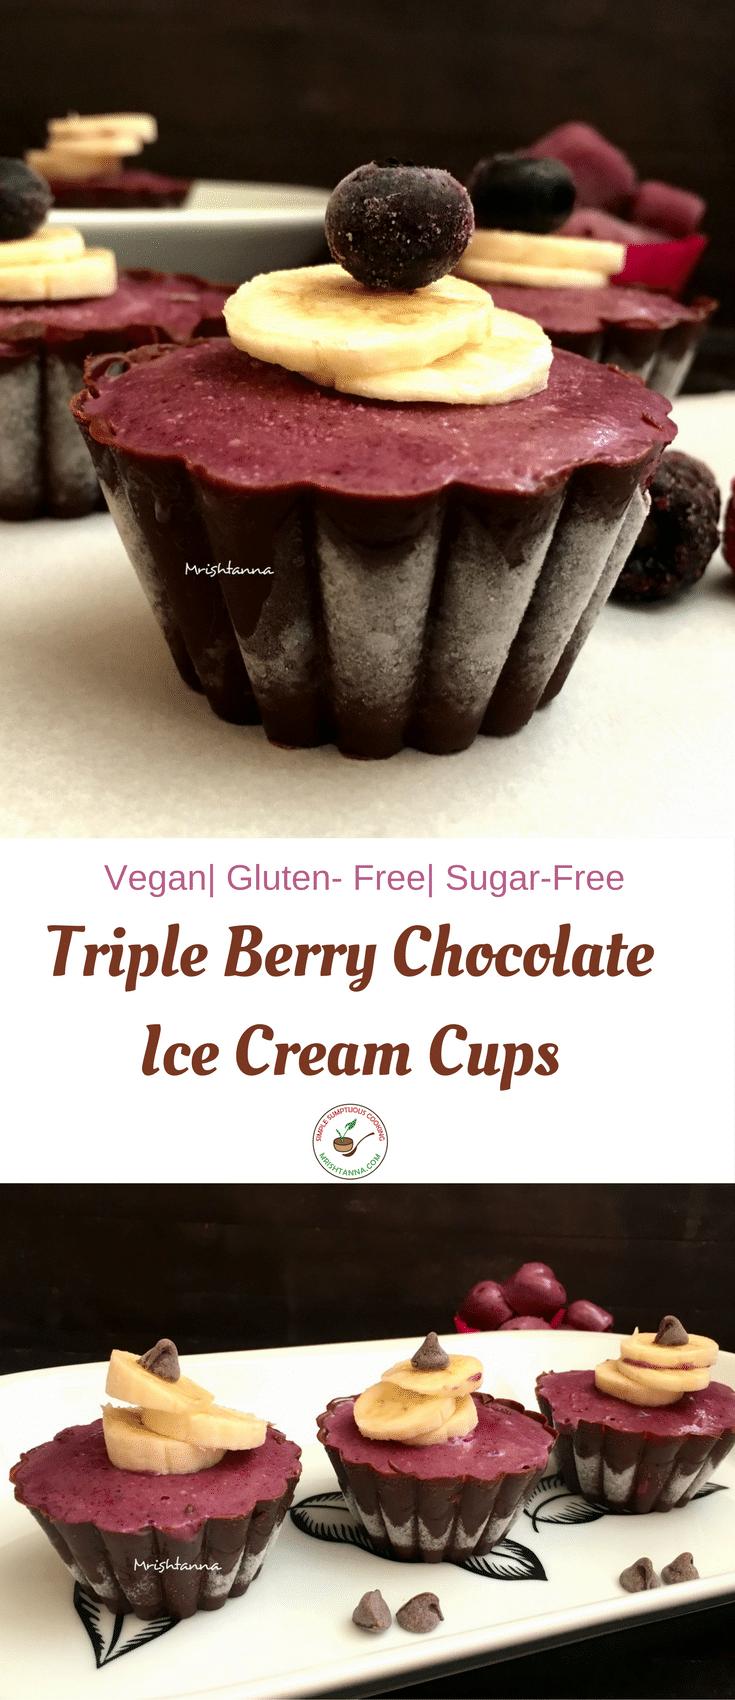 Triple Berry Chocolate Ice Cream Cups